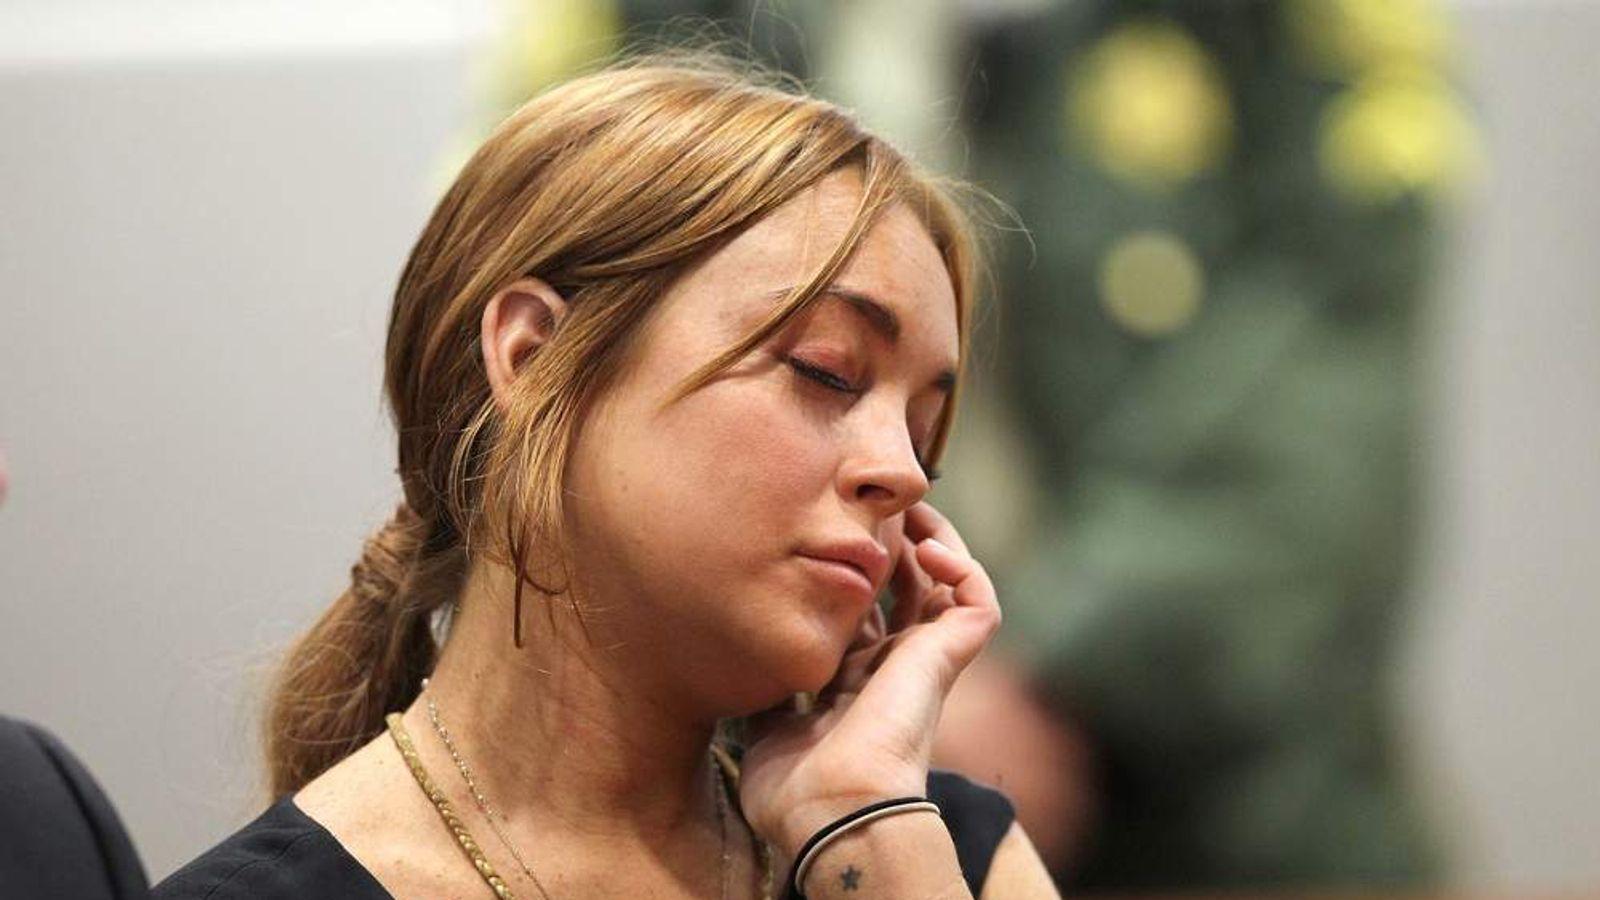 Lindsay Lohan avoids trial, gets rehab — again - nj.com